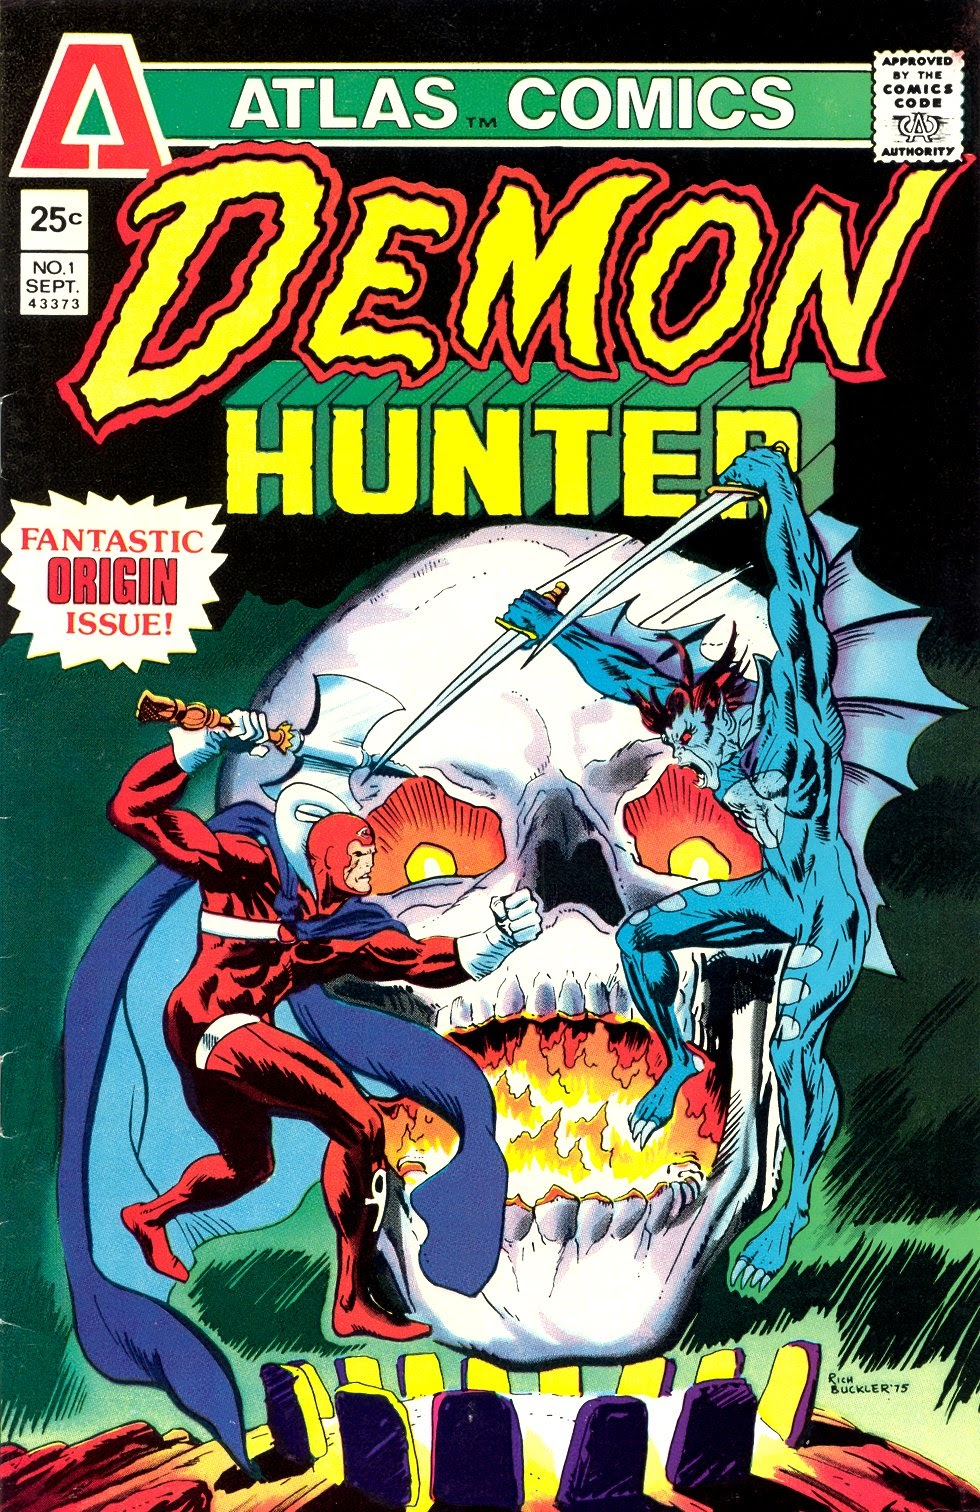 Demon-Hunter Full Page 1